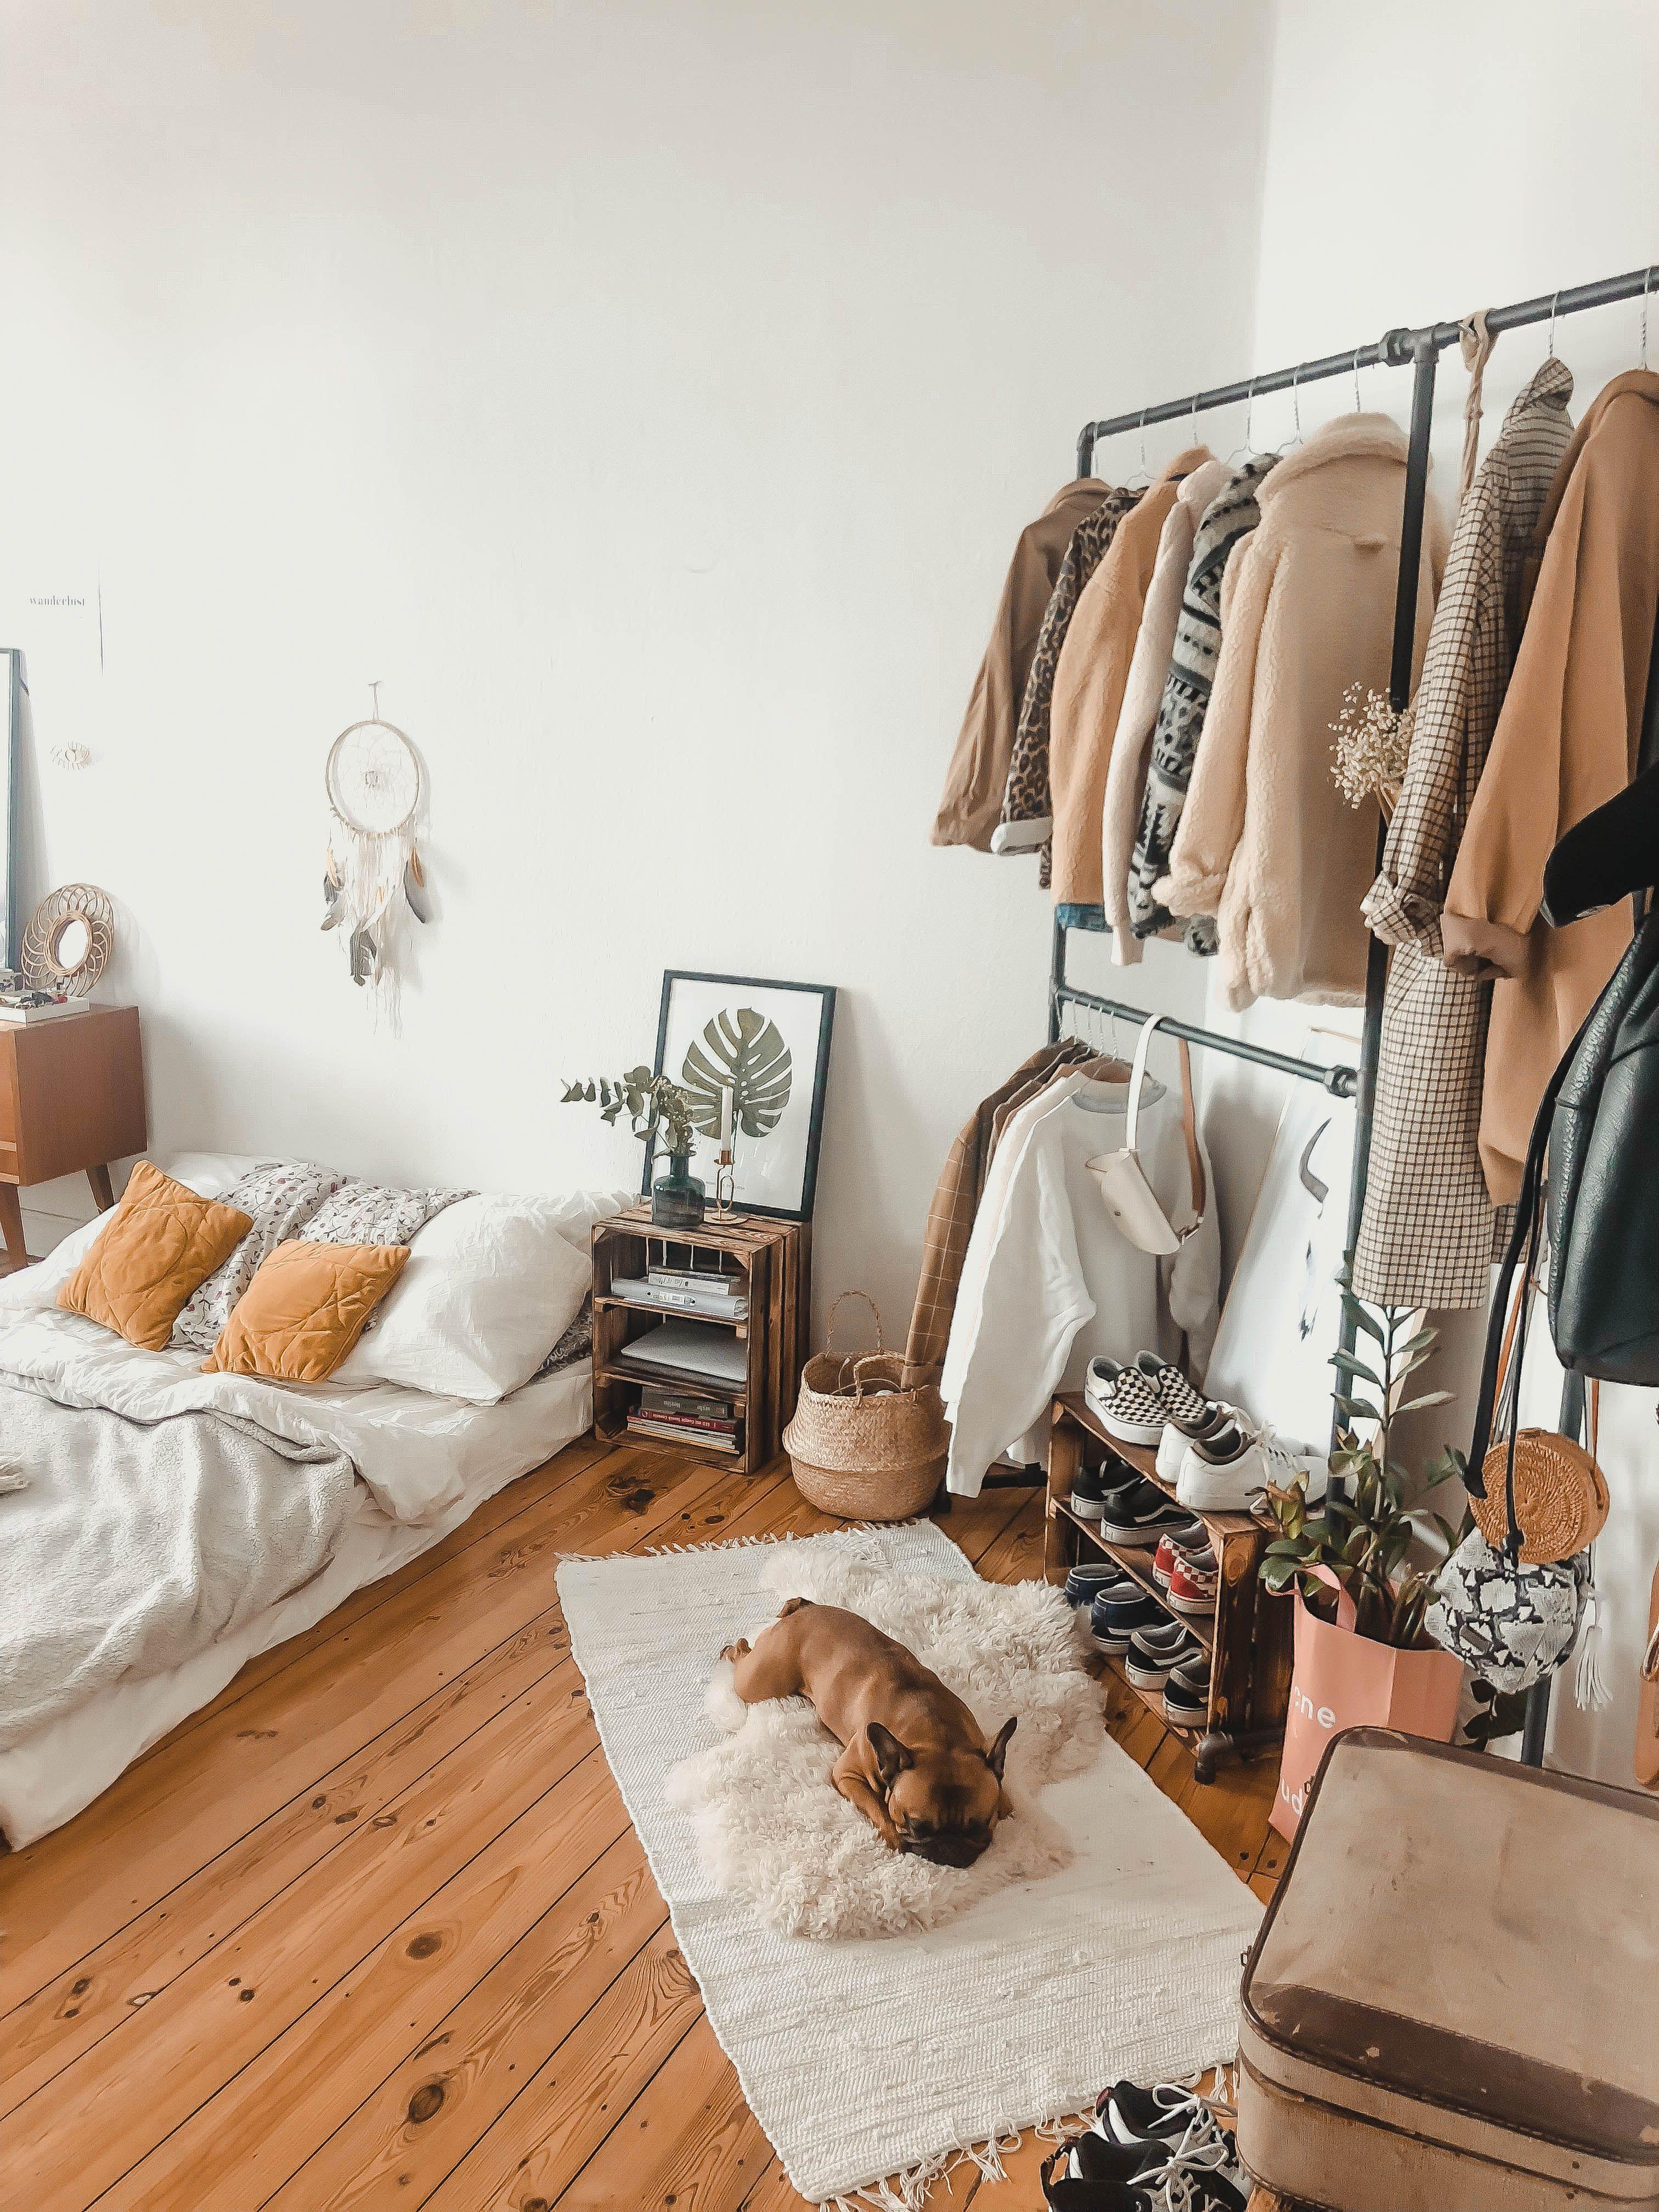 Pueppi C´est Moi - Fashionblog from Casselfornia #slaapkamerideeen